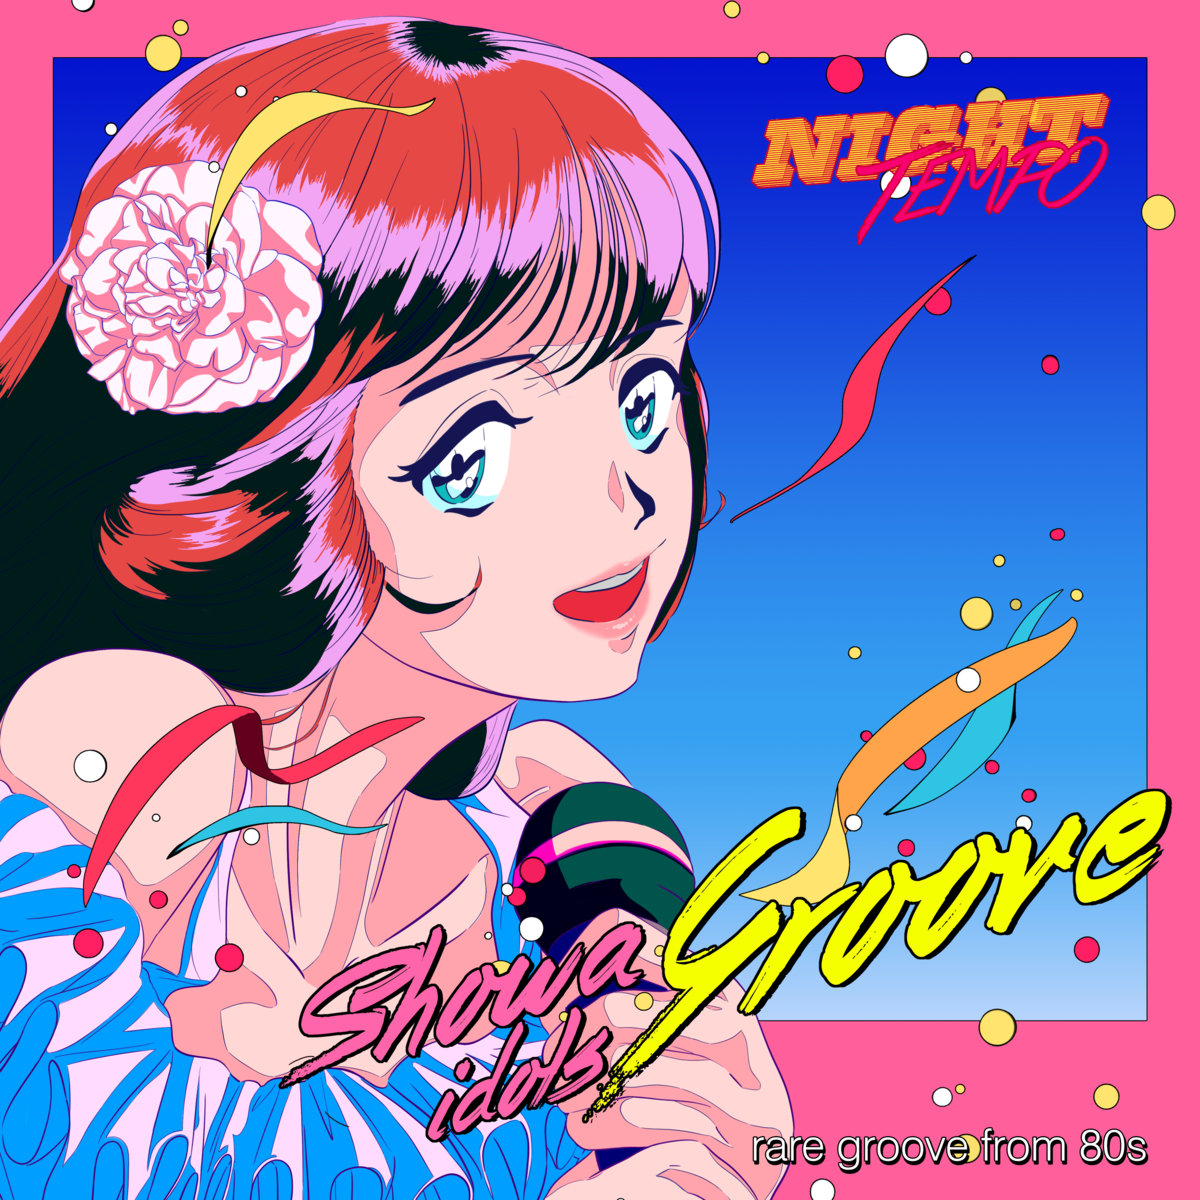 Night Tempo – Showa Idol's Groove [FLAC / WEB] [2019 03 17] – J-pop